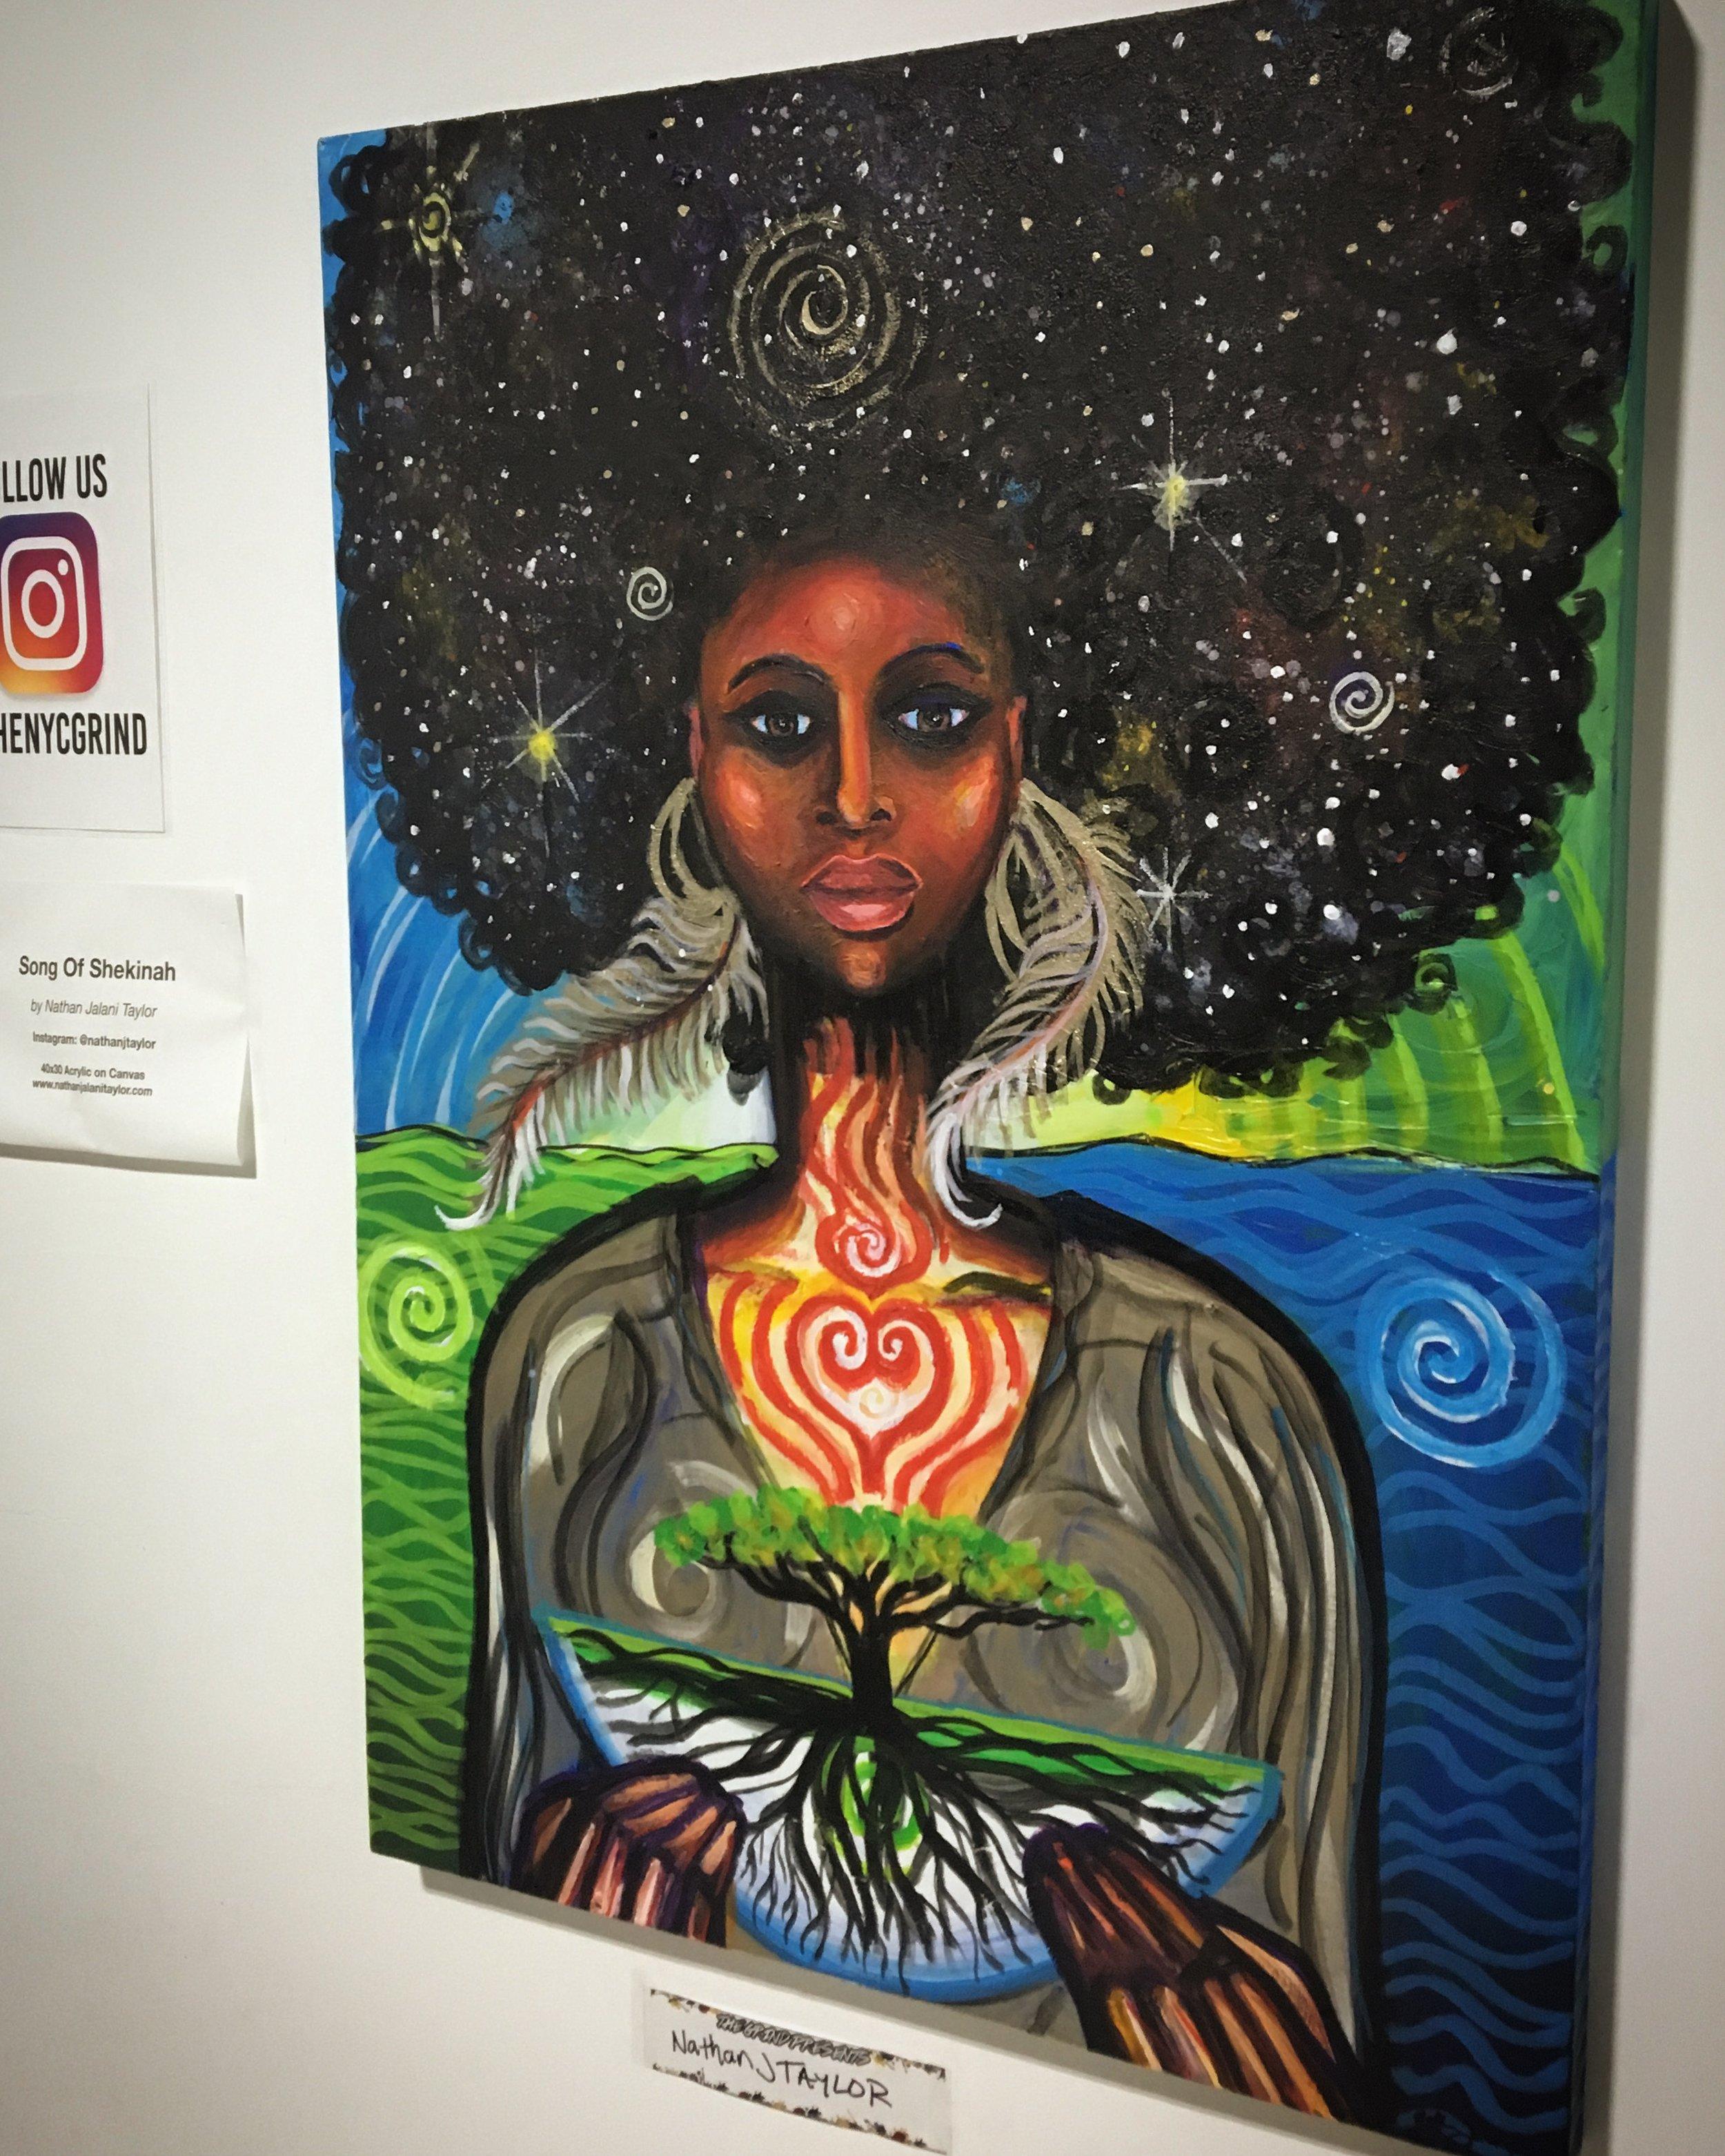 Song Of Shekinah, Painting by Nathan Jalani Taylor on display at the NYC Grind, Queens, NY